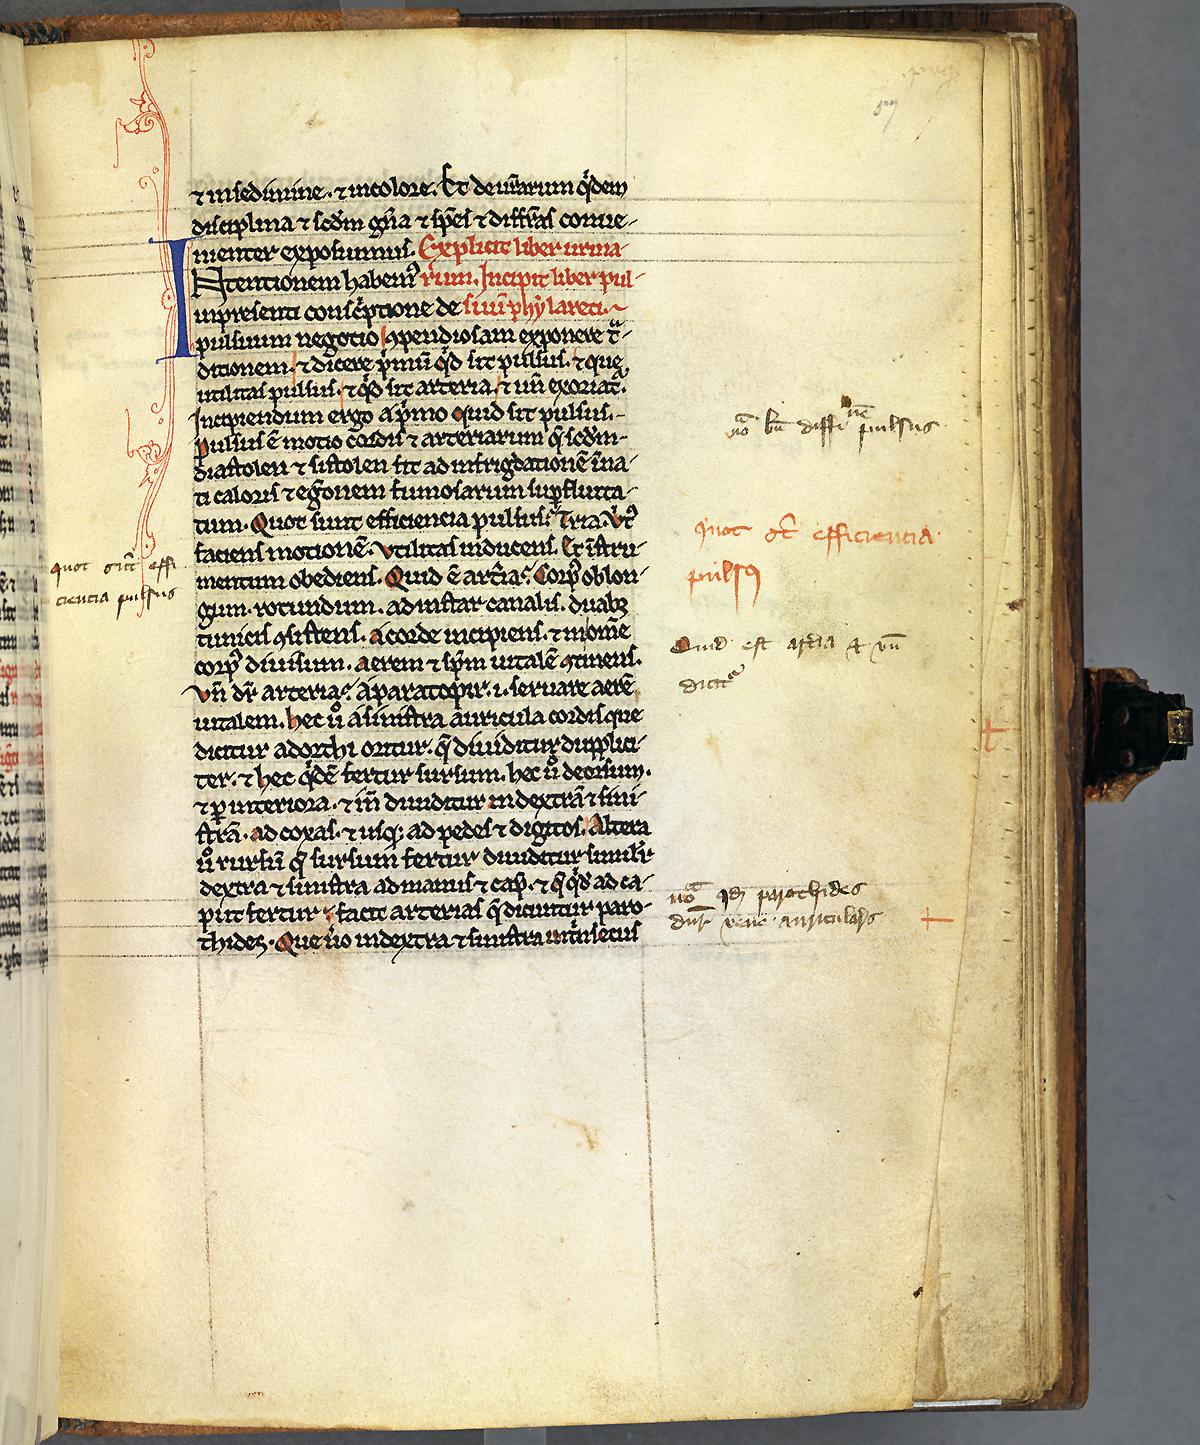 Medieval Latin Translation